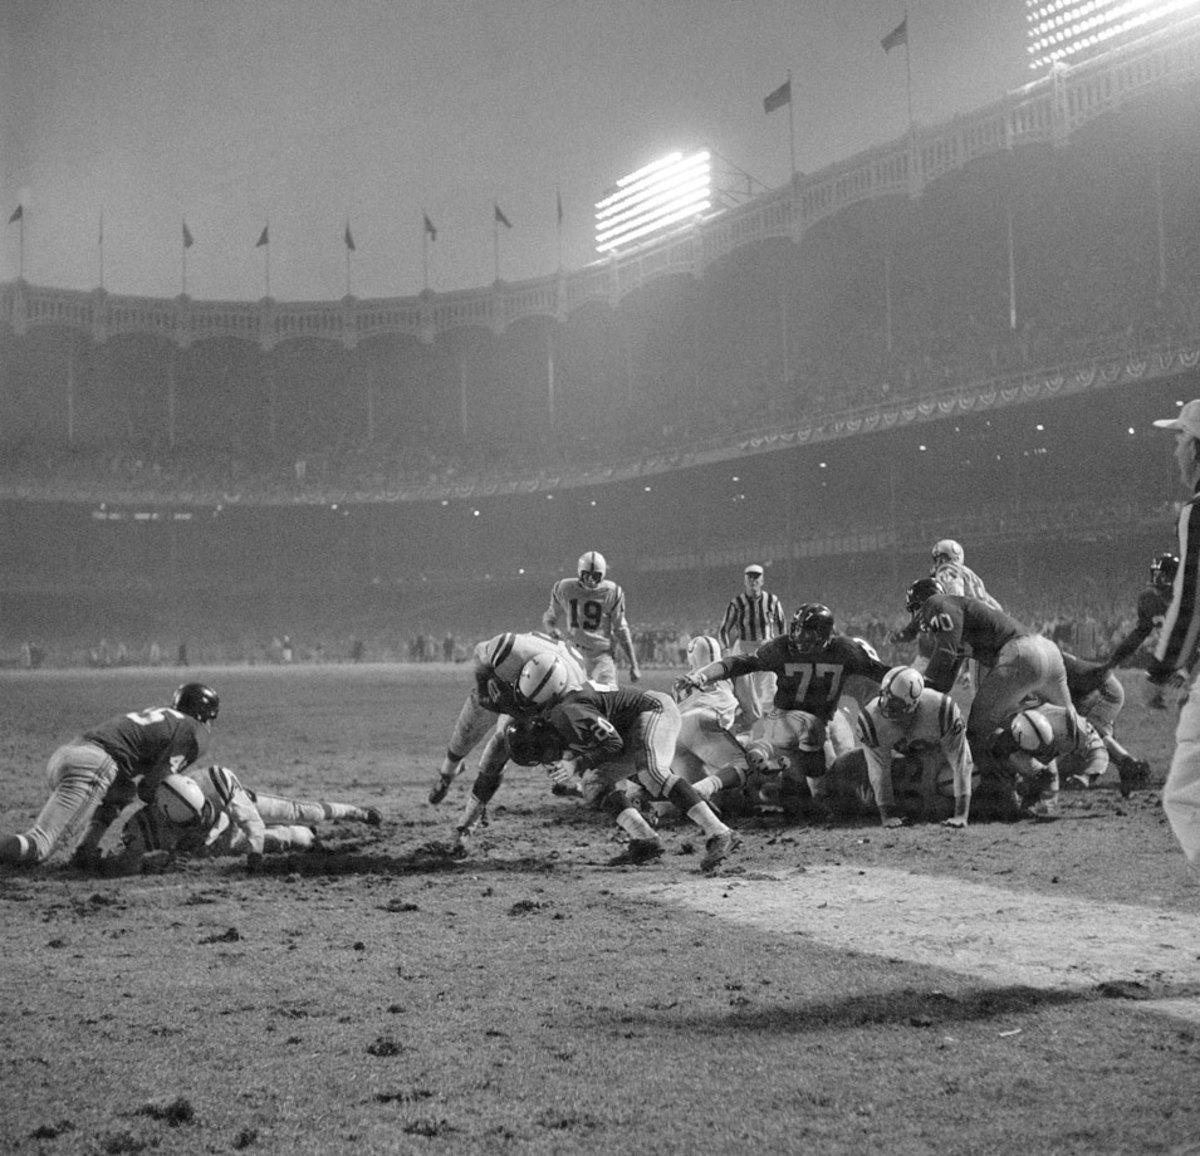 1958-NFL-Championship-Alan-Ameche-01068344.jpg